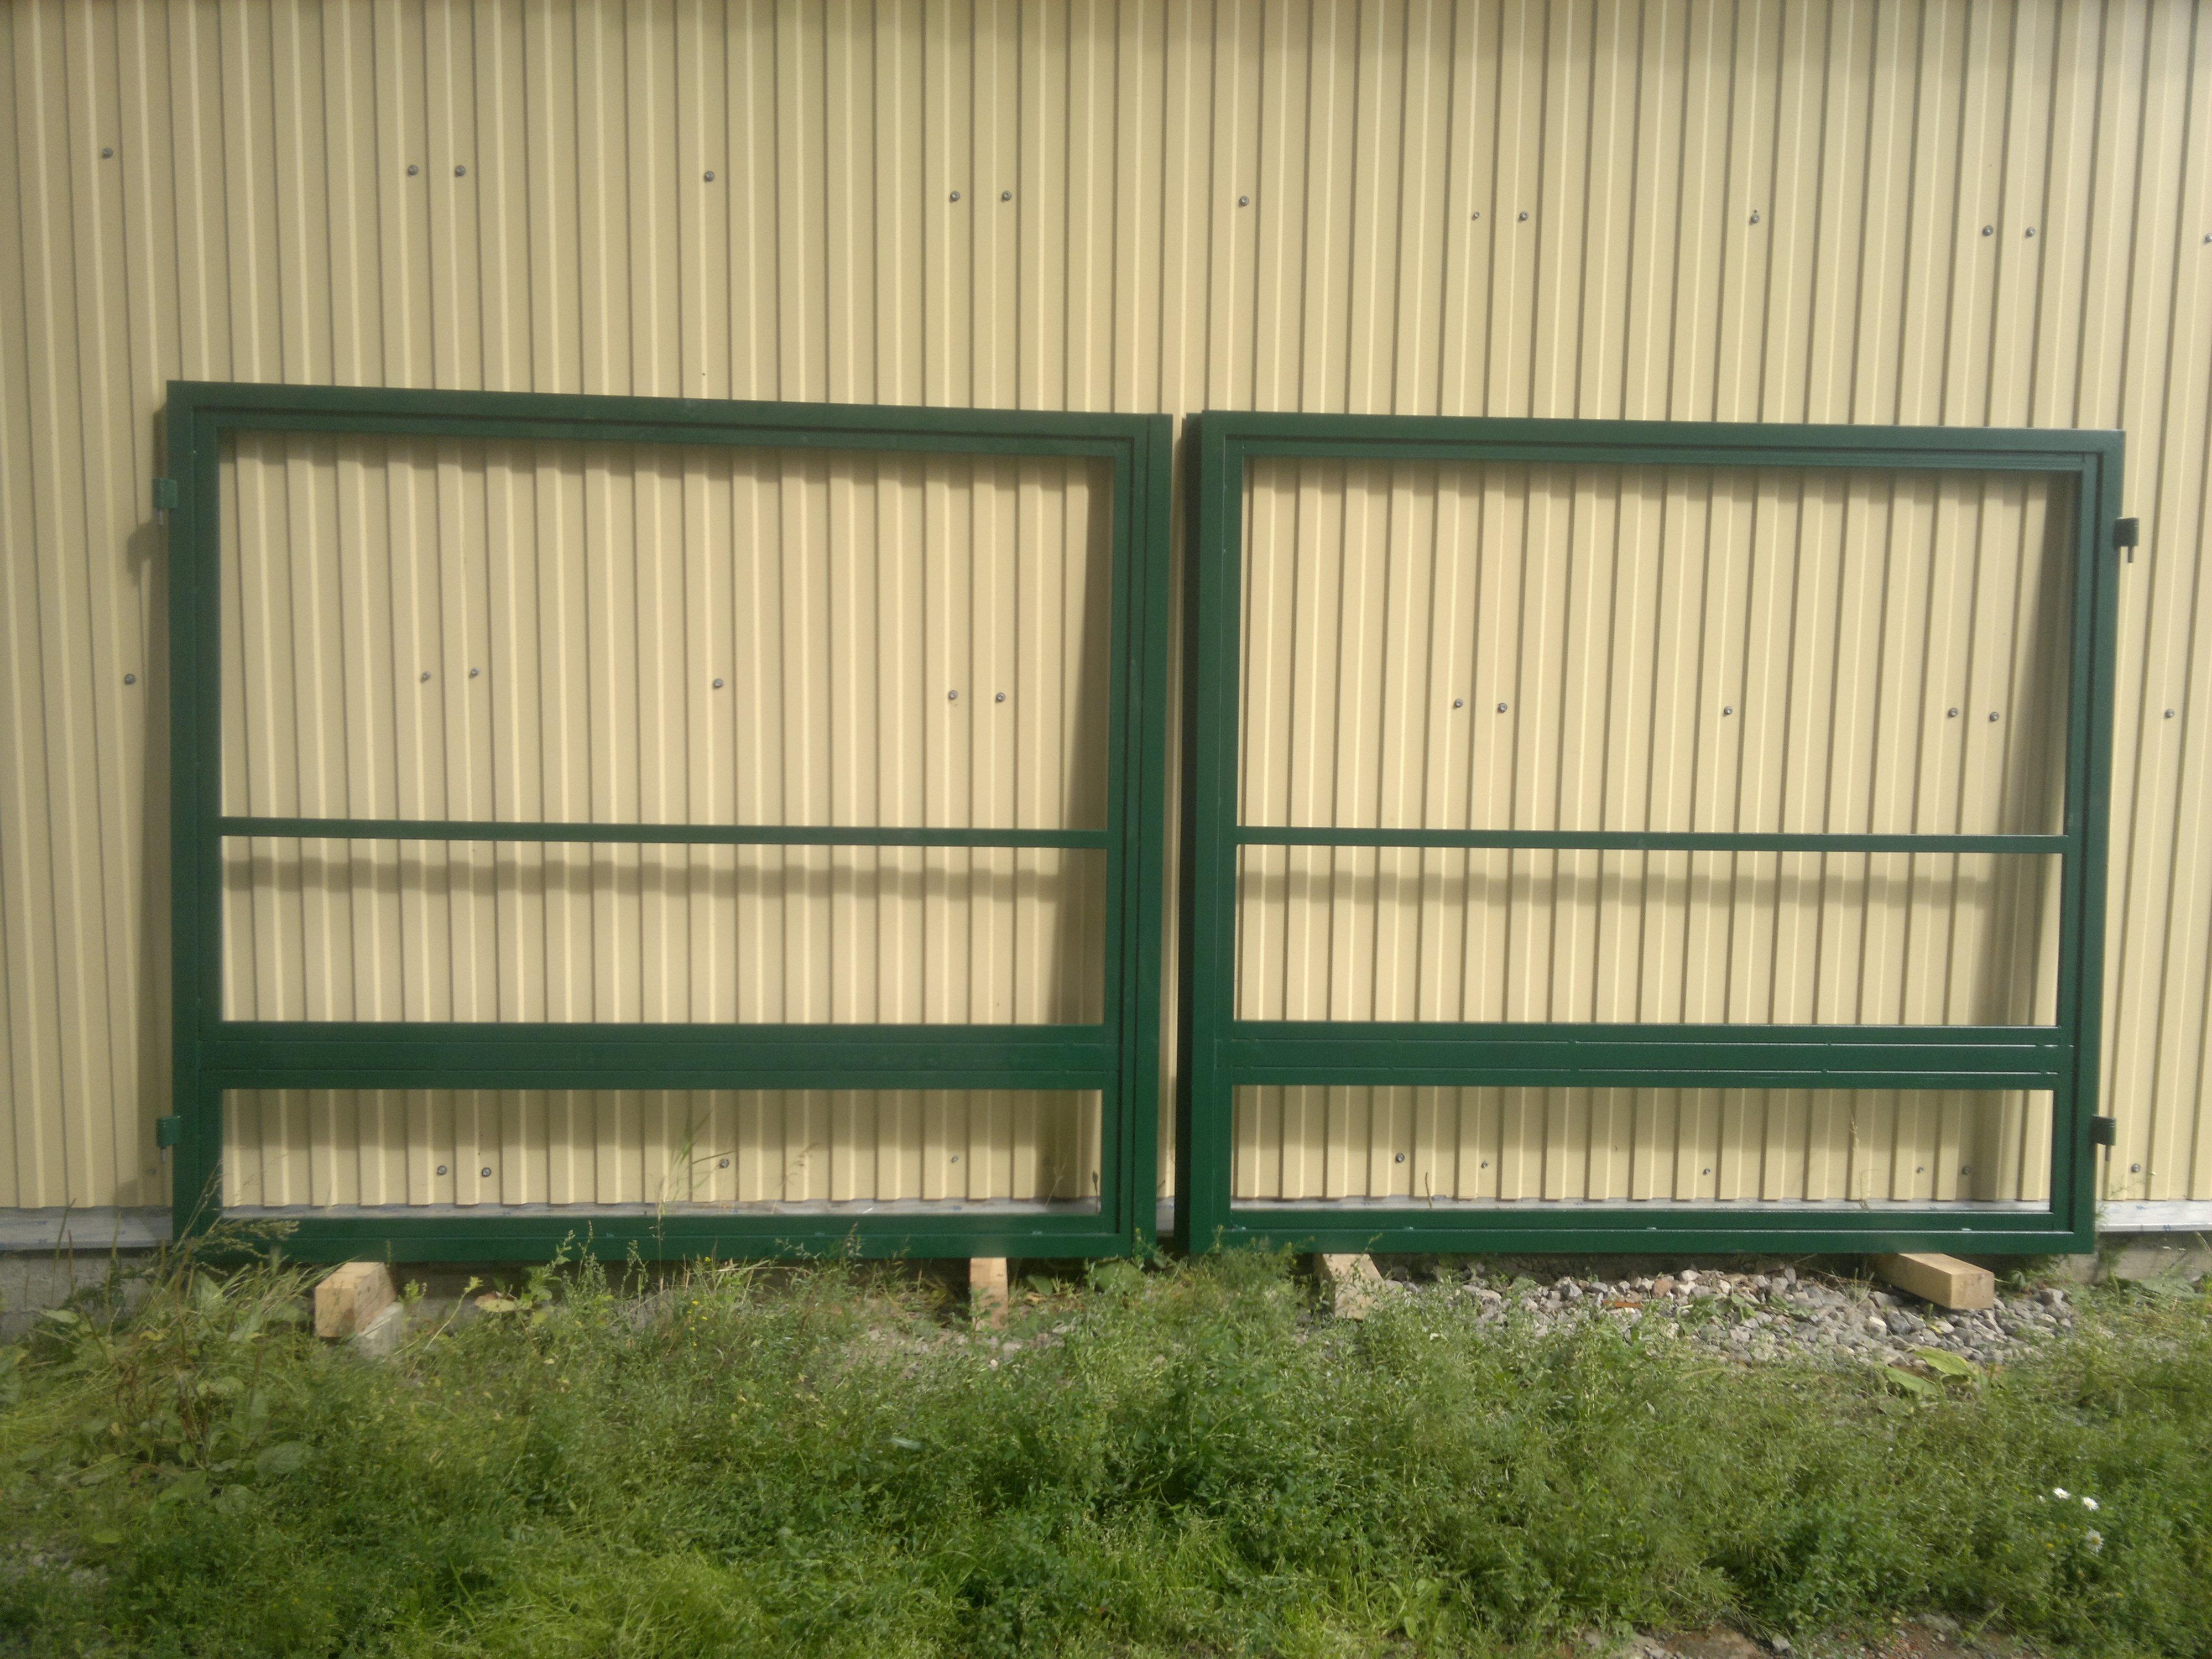 Каркас распашных ворот без заполнения  4000 х 2000 (без окраски)